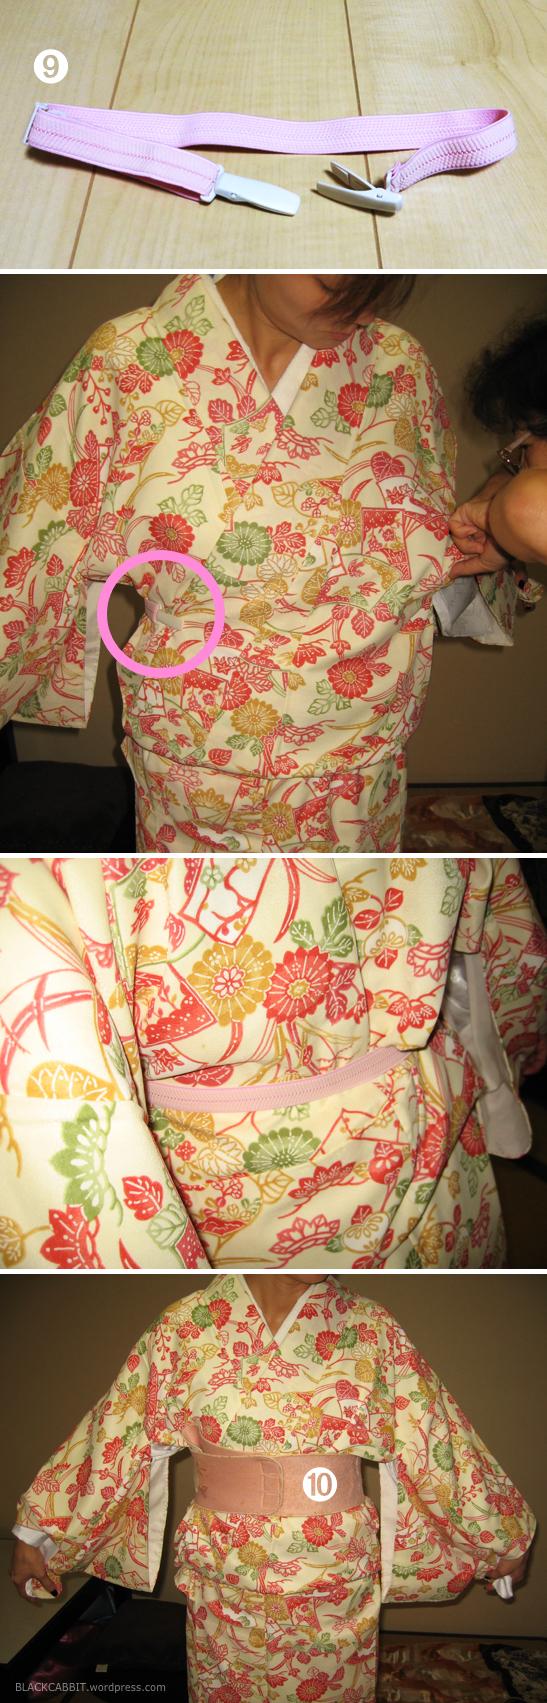 Using Kimono belt